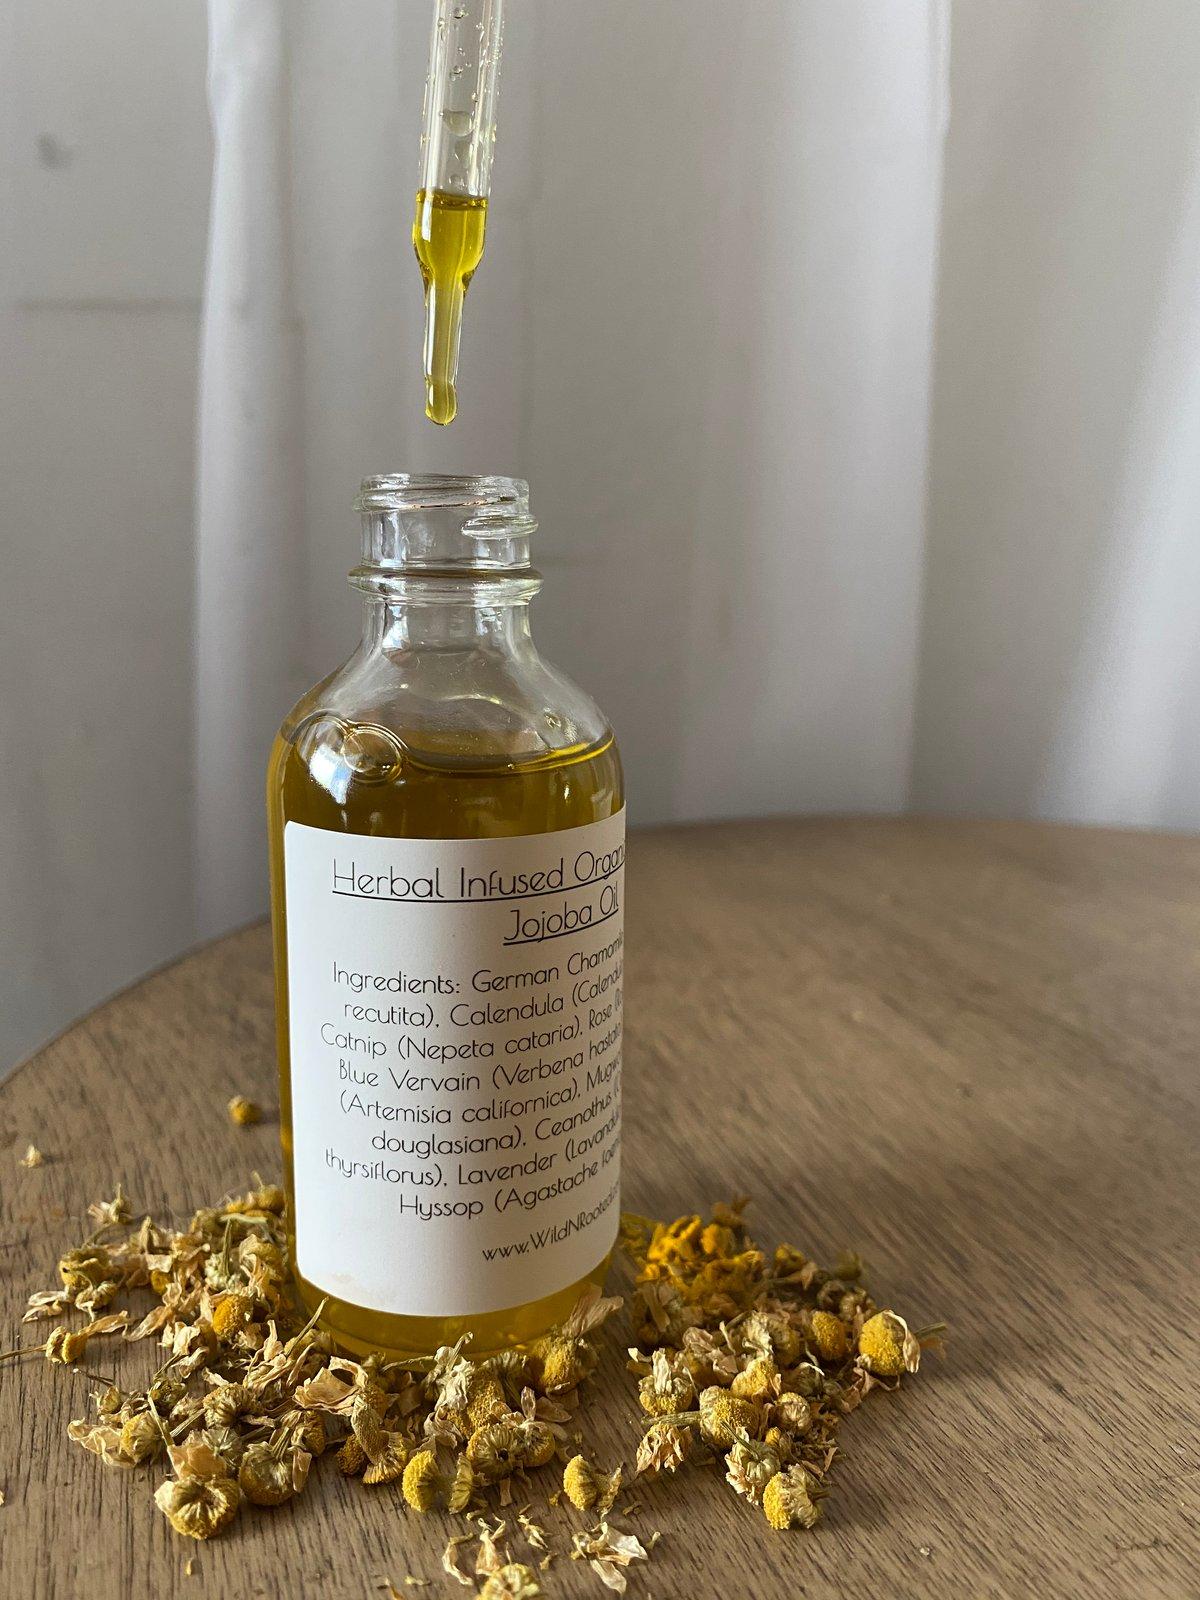 Herbal Infused Organic Golden Jojoba Oil